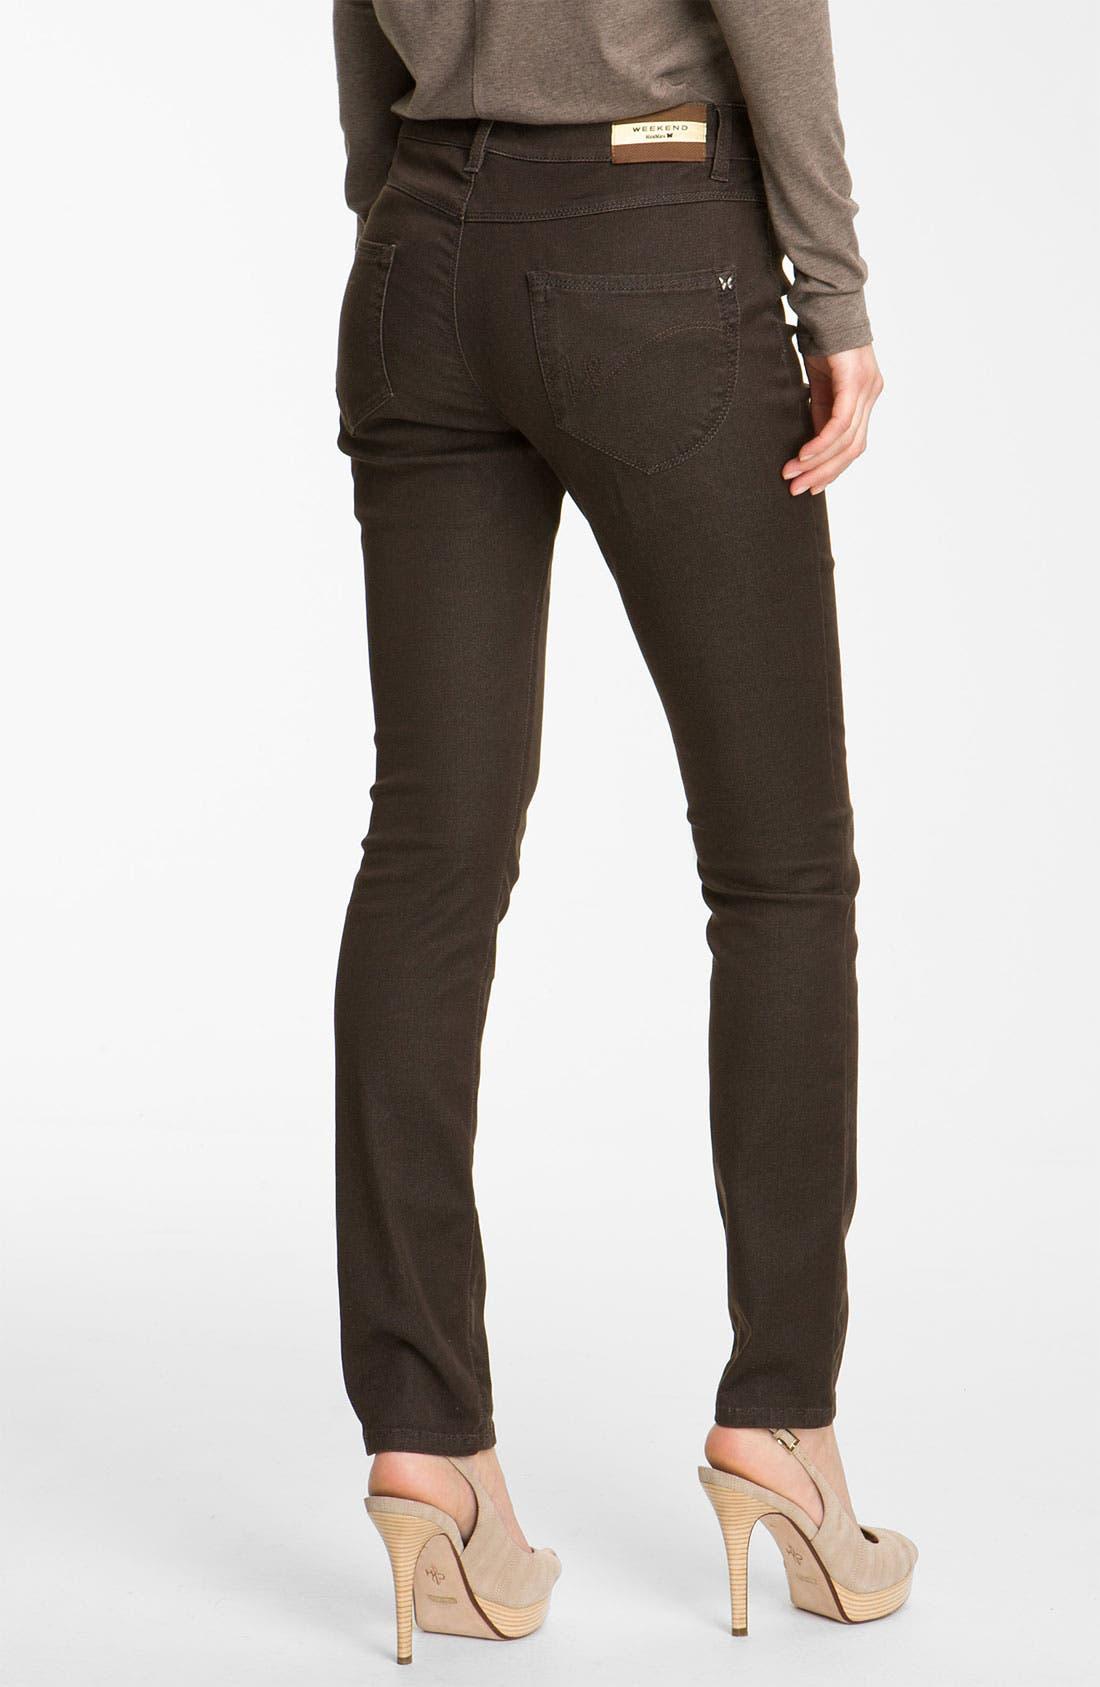 Main Image - Weekend Max Mara 'Jolly' Jeans